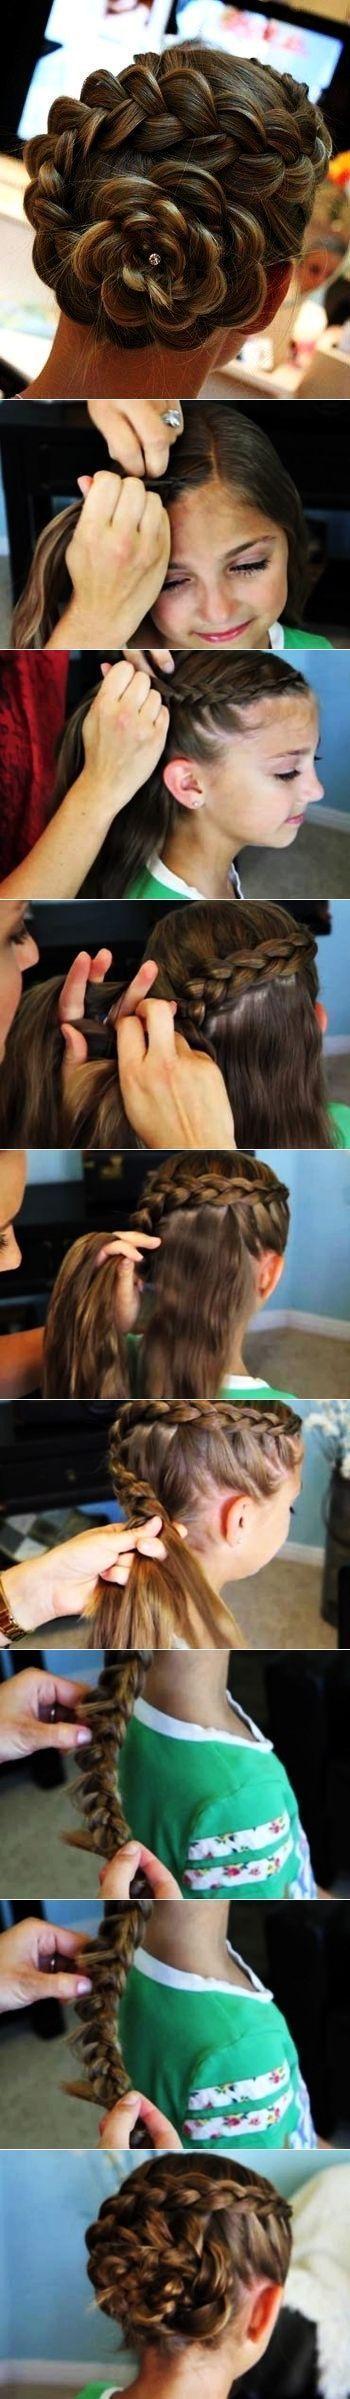 DIY Flower Hair beauty long hair updo braids how to diy hair hairstyles tutorials hair tutorials easy hairstyles #diyhairstyleseasy #diyhairstylesupdo #braidedhairstylestutorials